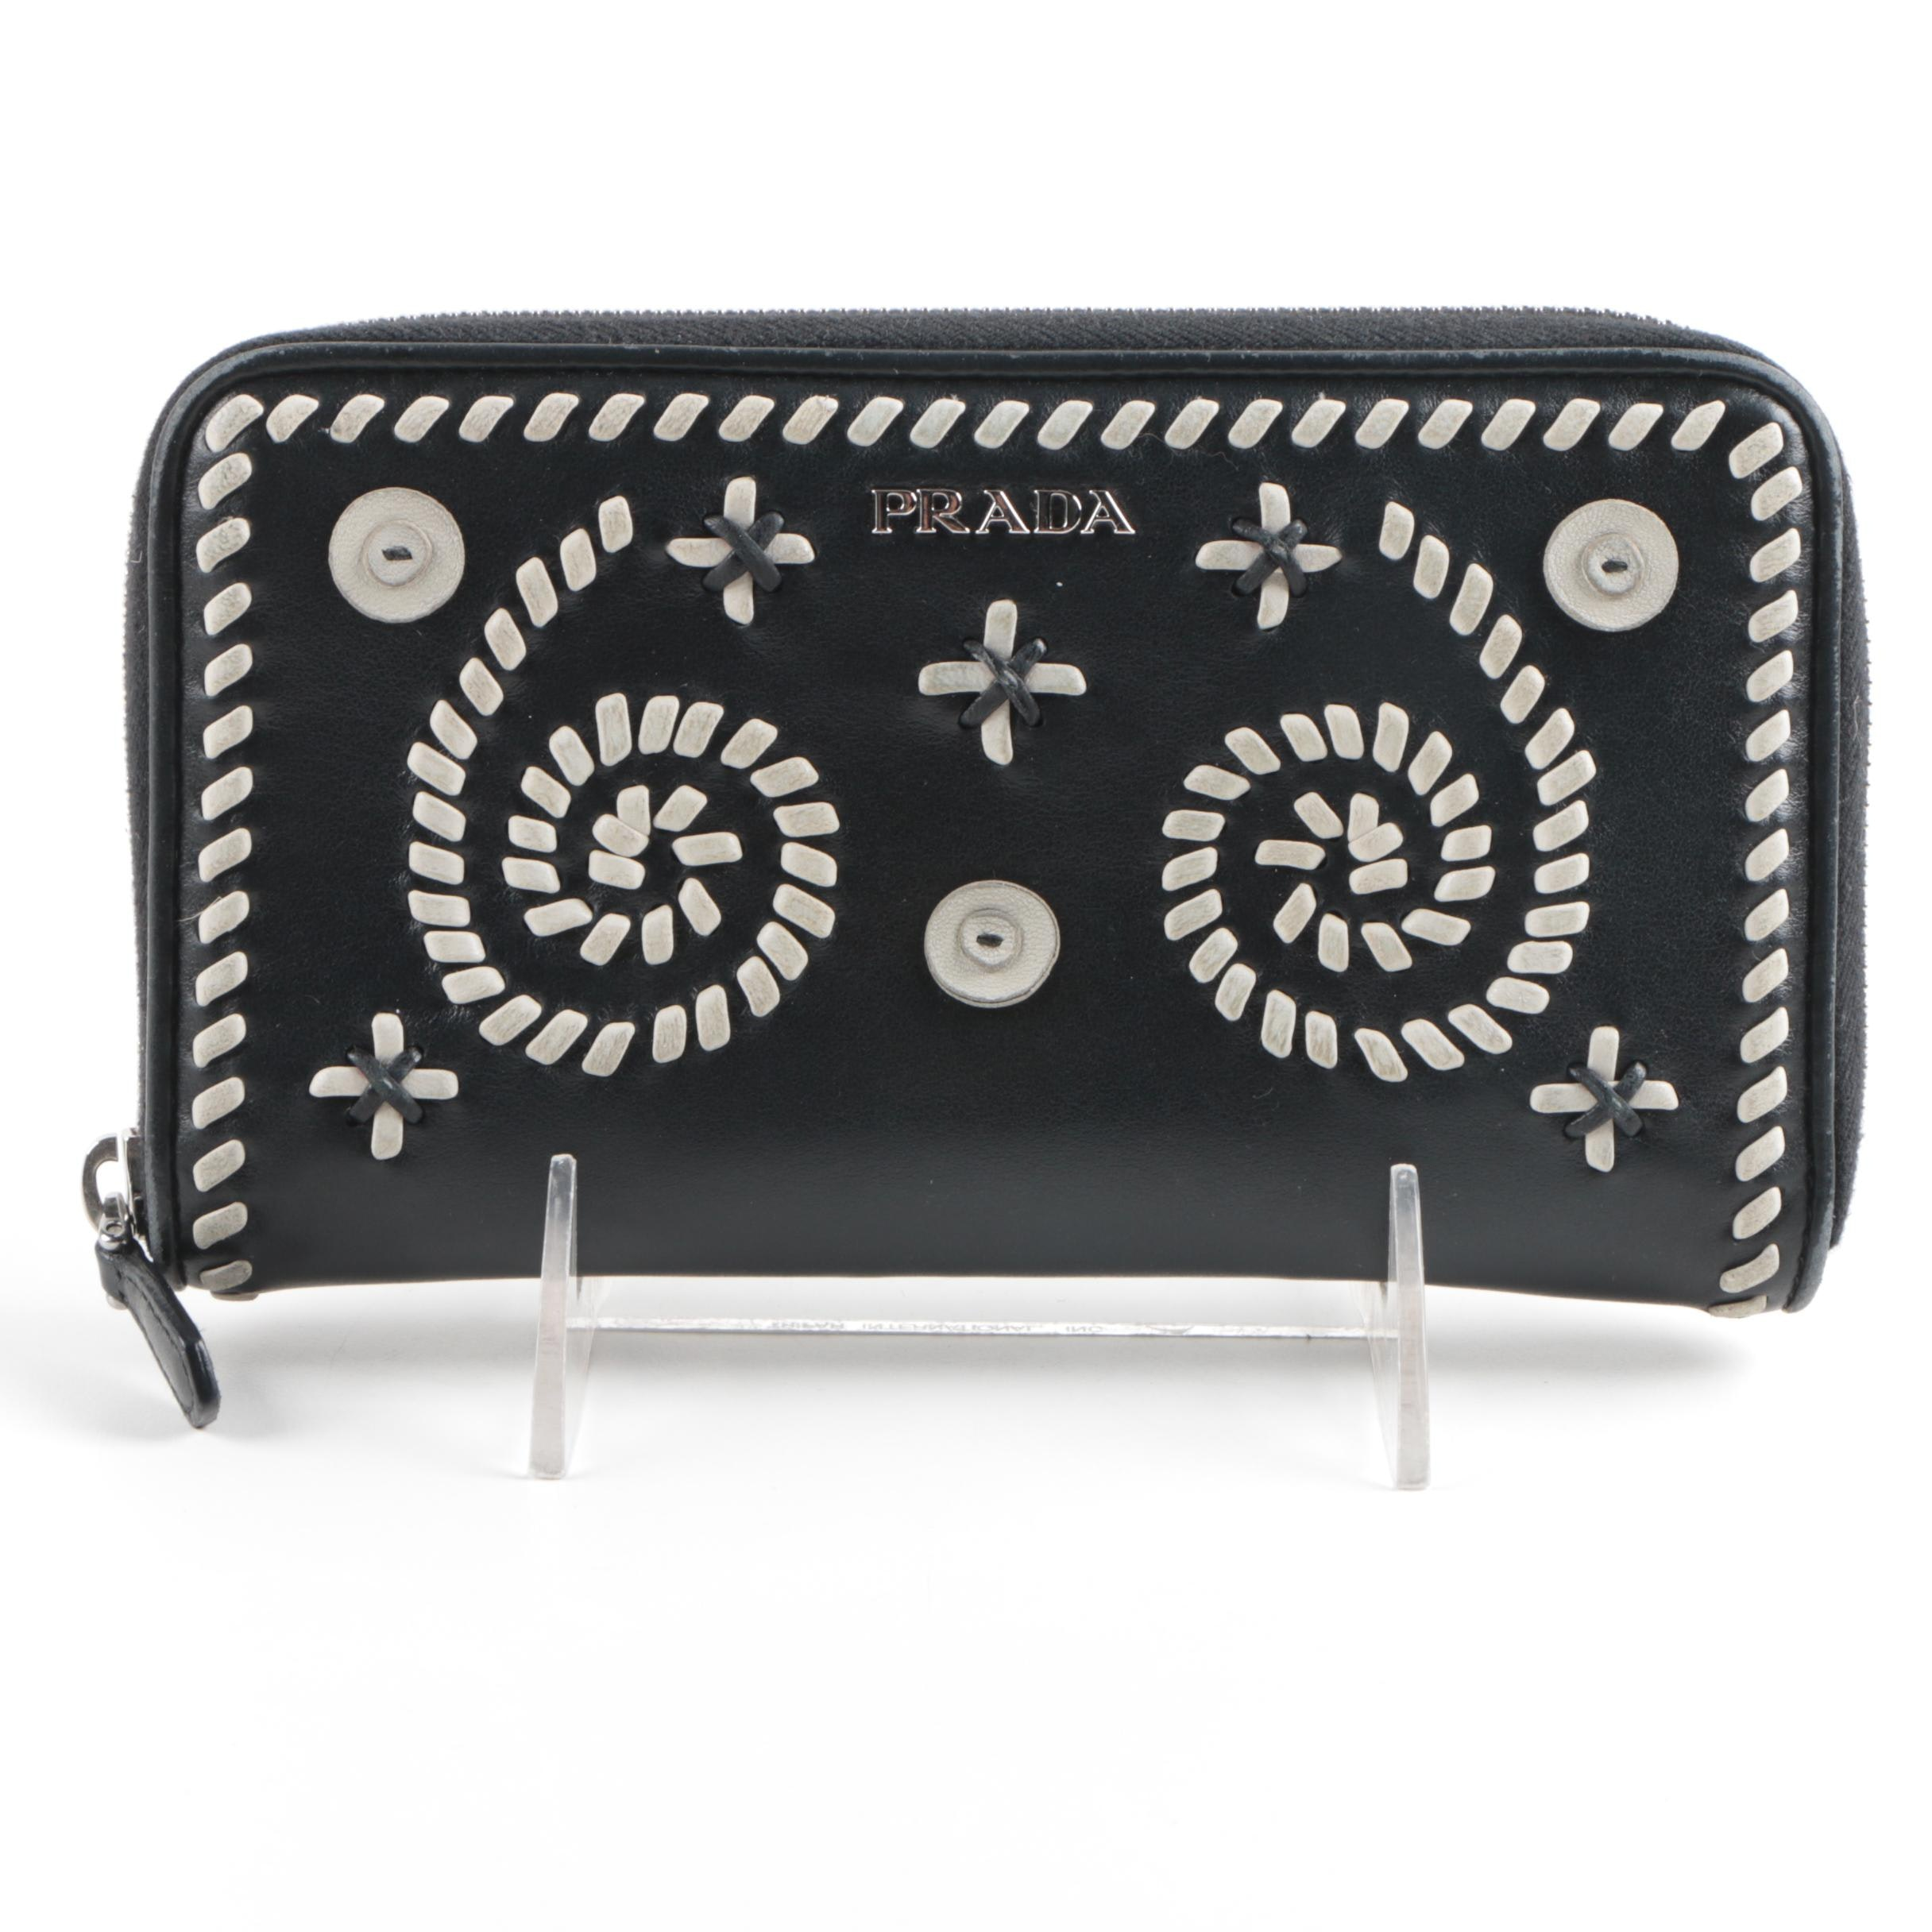 Prada Black and White Leather Wallet